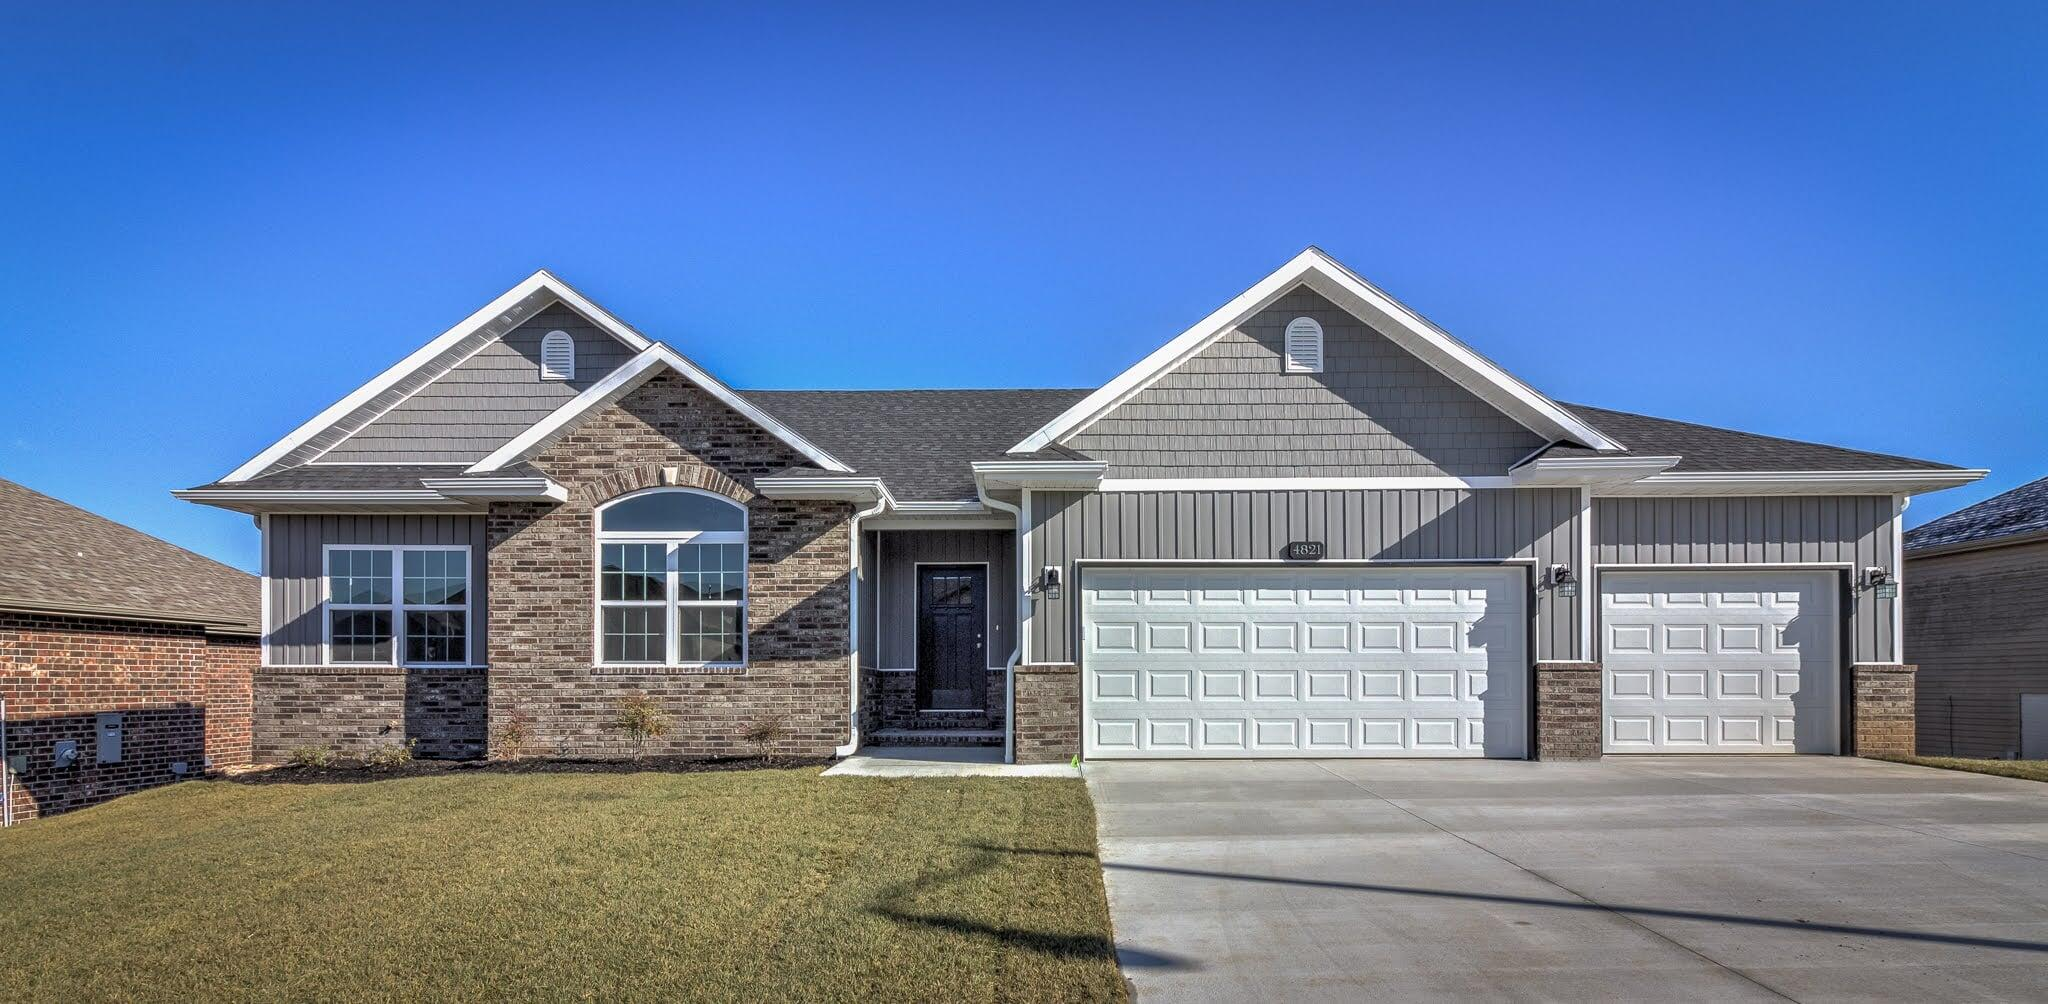 Lot 24 Lakewood Estates 2nd Addition Rogersville, MO 65742